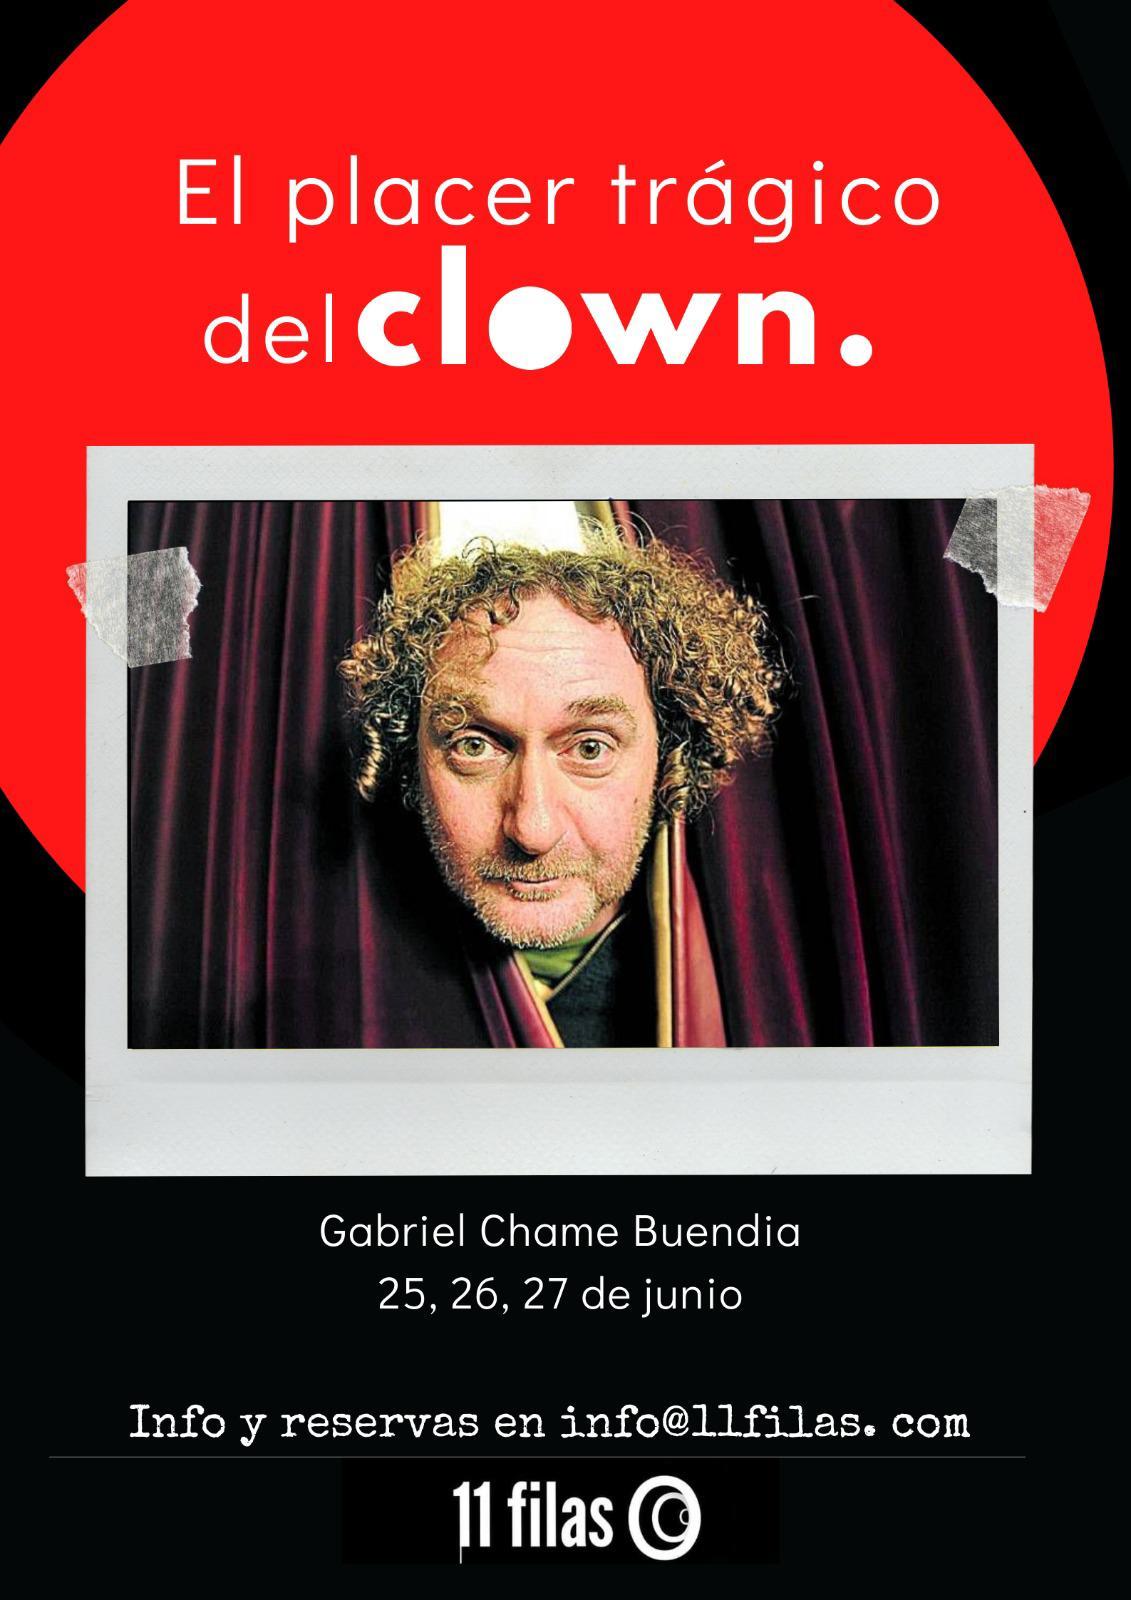 Curso de Clown con Gabriel Chame